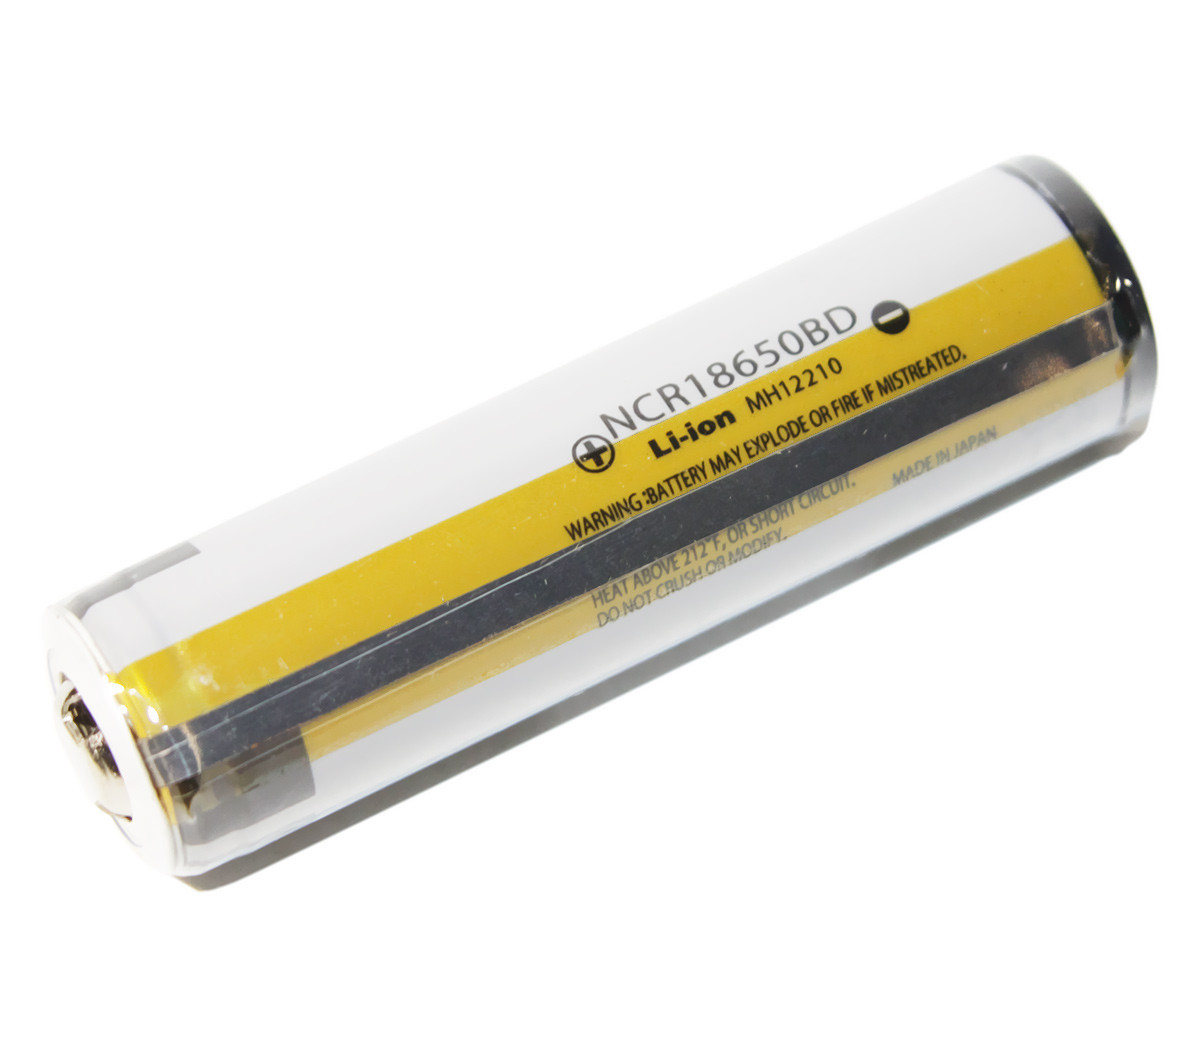 Аккумулятор 18650, 3400 mAh, Panasonic, NCR18650BD Protected, 3400mAh, 6.8A, 4.2/3.6/2.5V, перезаряжаемая